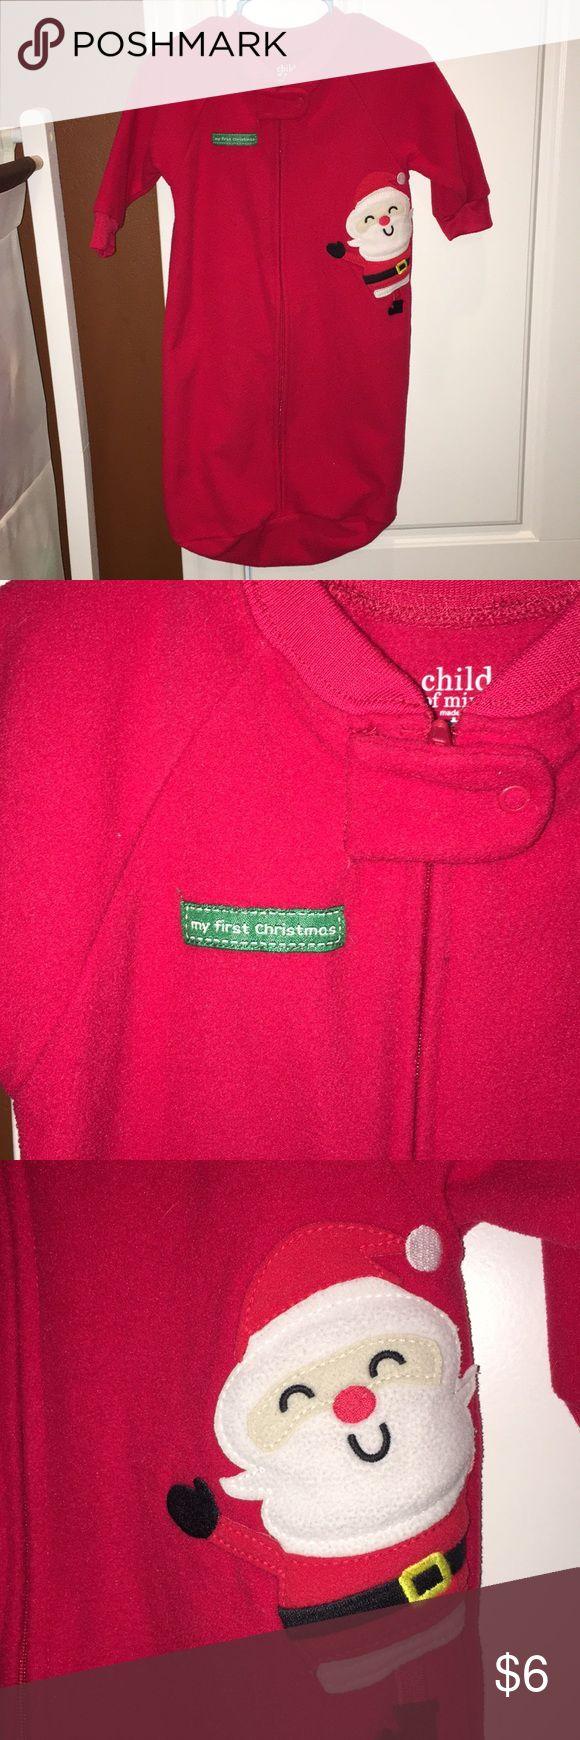 👶🏼My First Christmas Blanket Sleeper 0-9M Child of Mine by Carter's 0-9 months. Super adorable. EUC. Pajamas Sleep Sacks